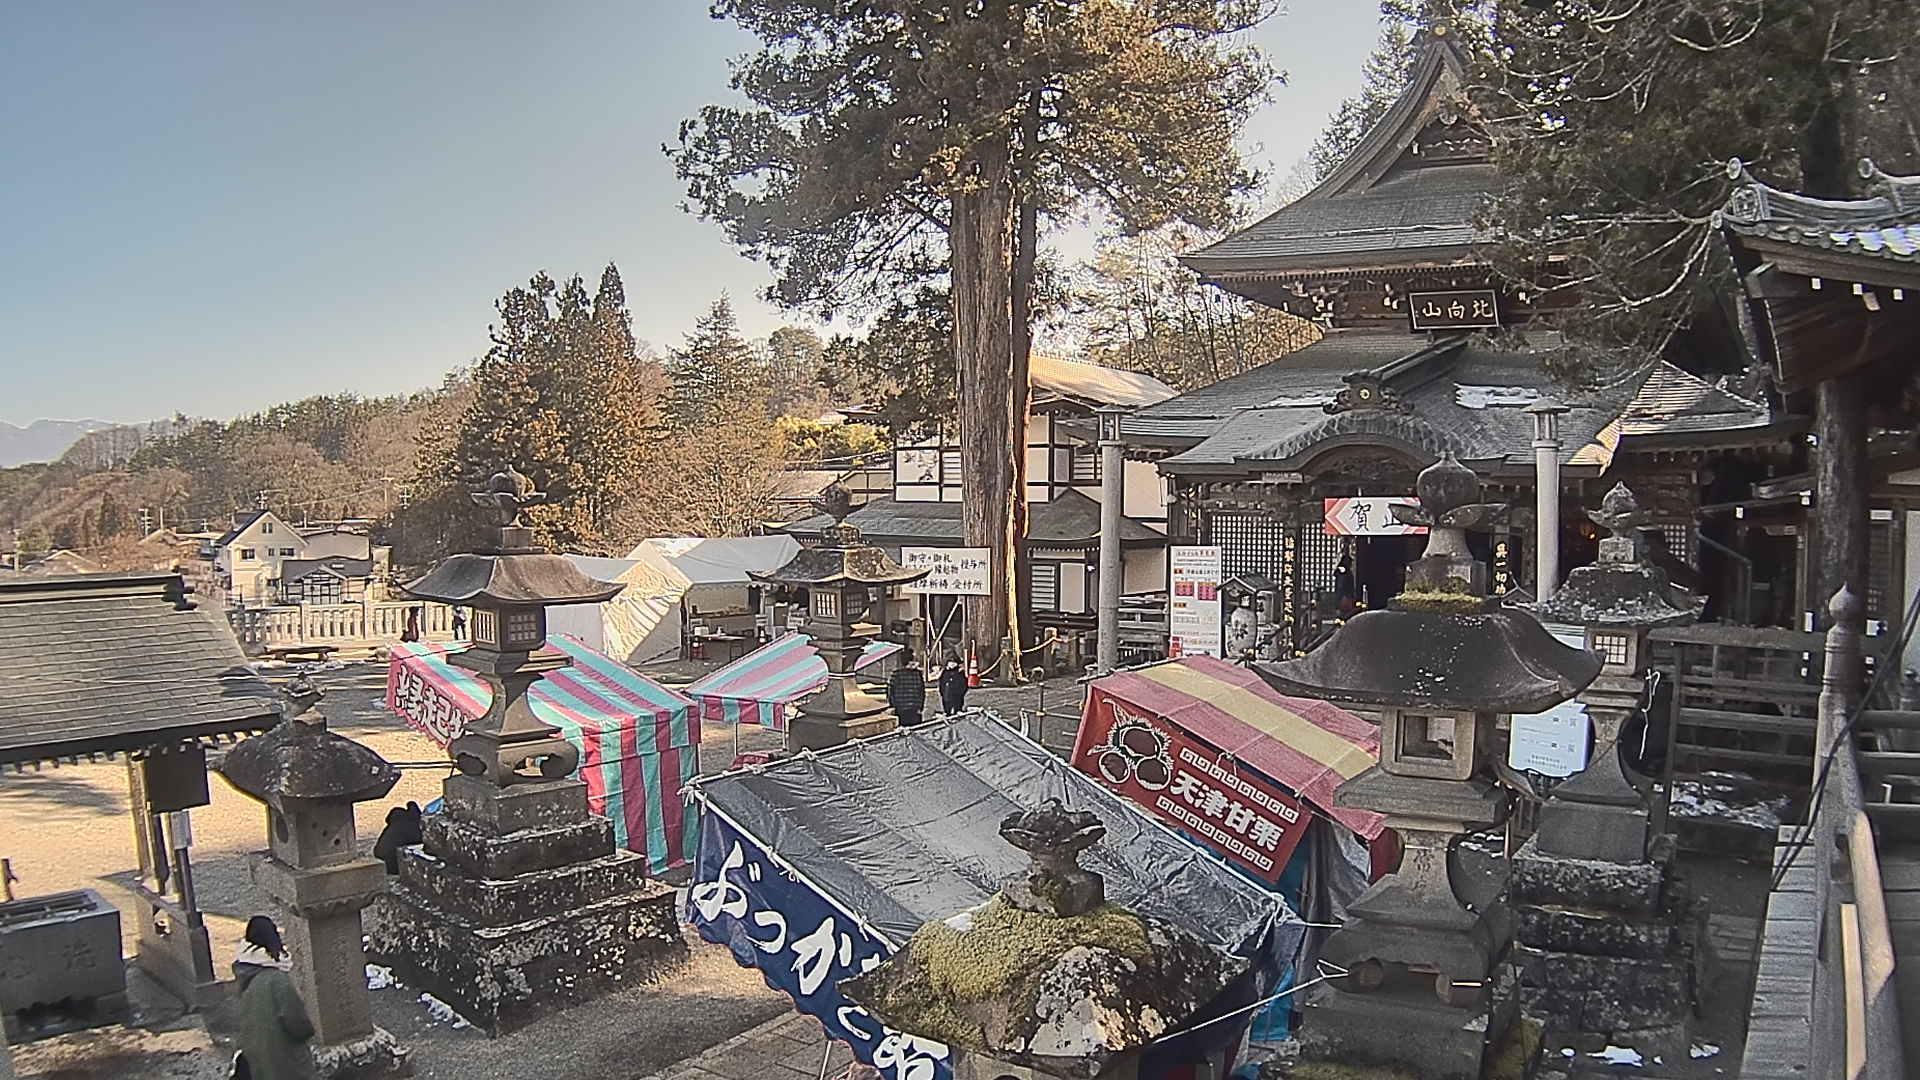 Webcam 別所温泉: 上田市 北向観音